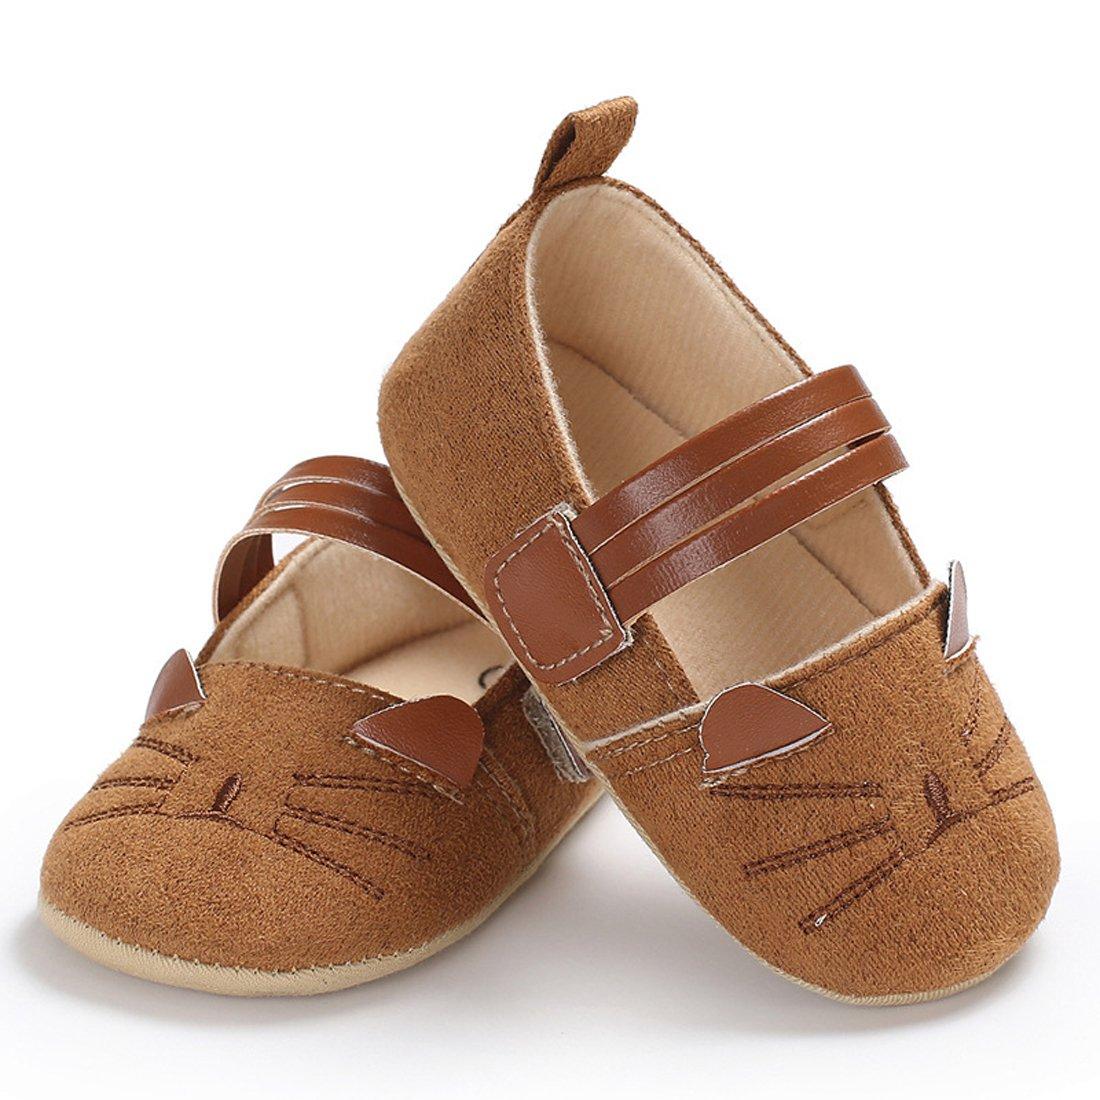 Gaorui Baby Shoes Toddler Boy Girls First Walker Slippers Anti-Slip Sneaker Spring Cartoon Cat Shoes